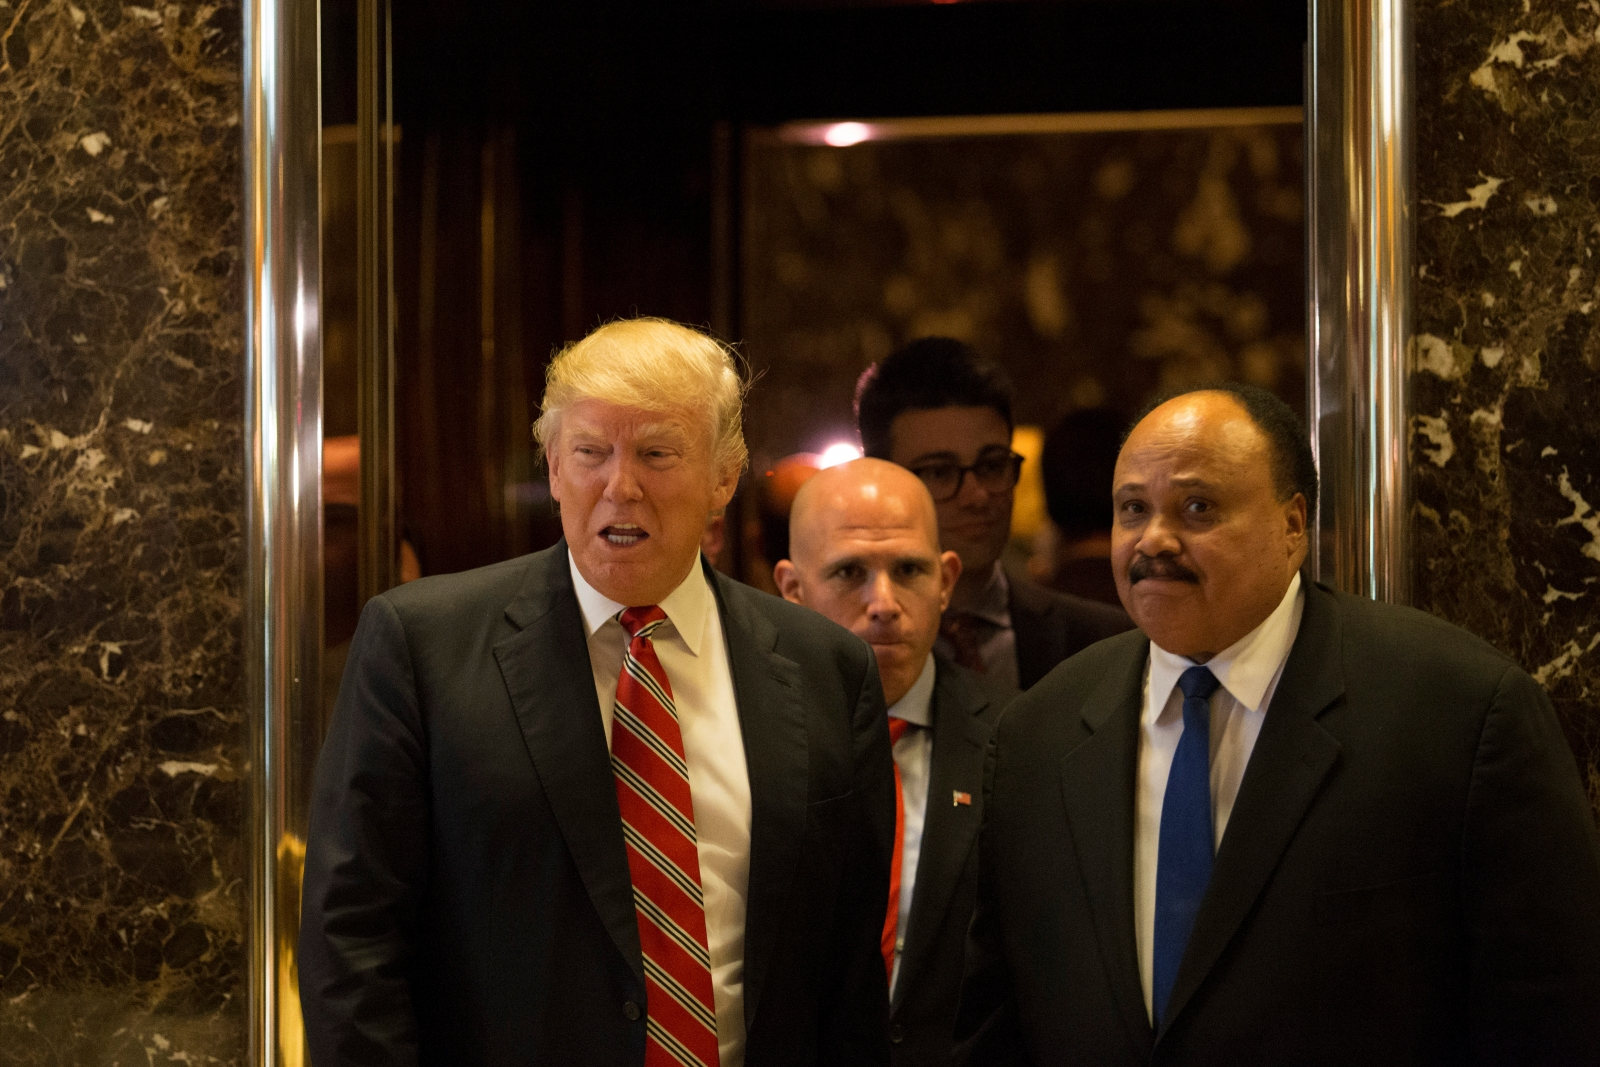 Donald Trump, Martin Luther King III